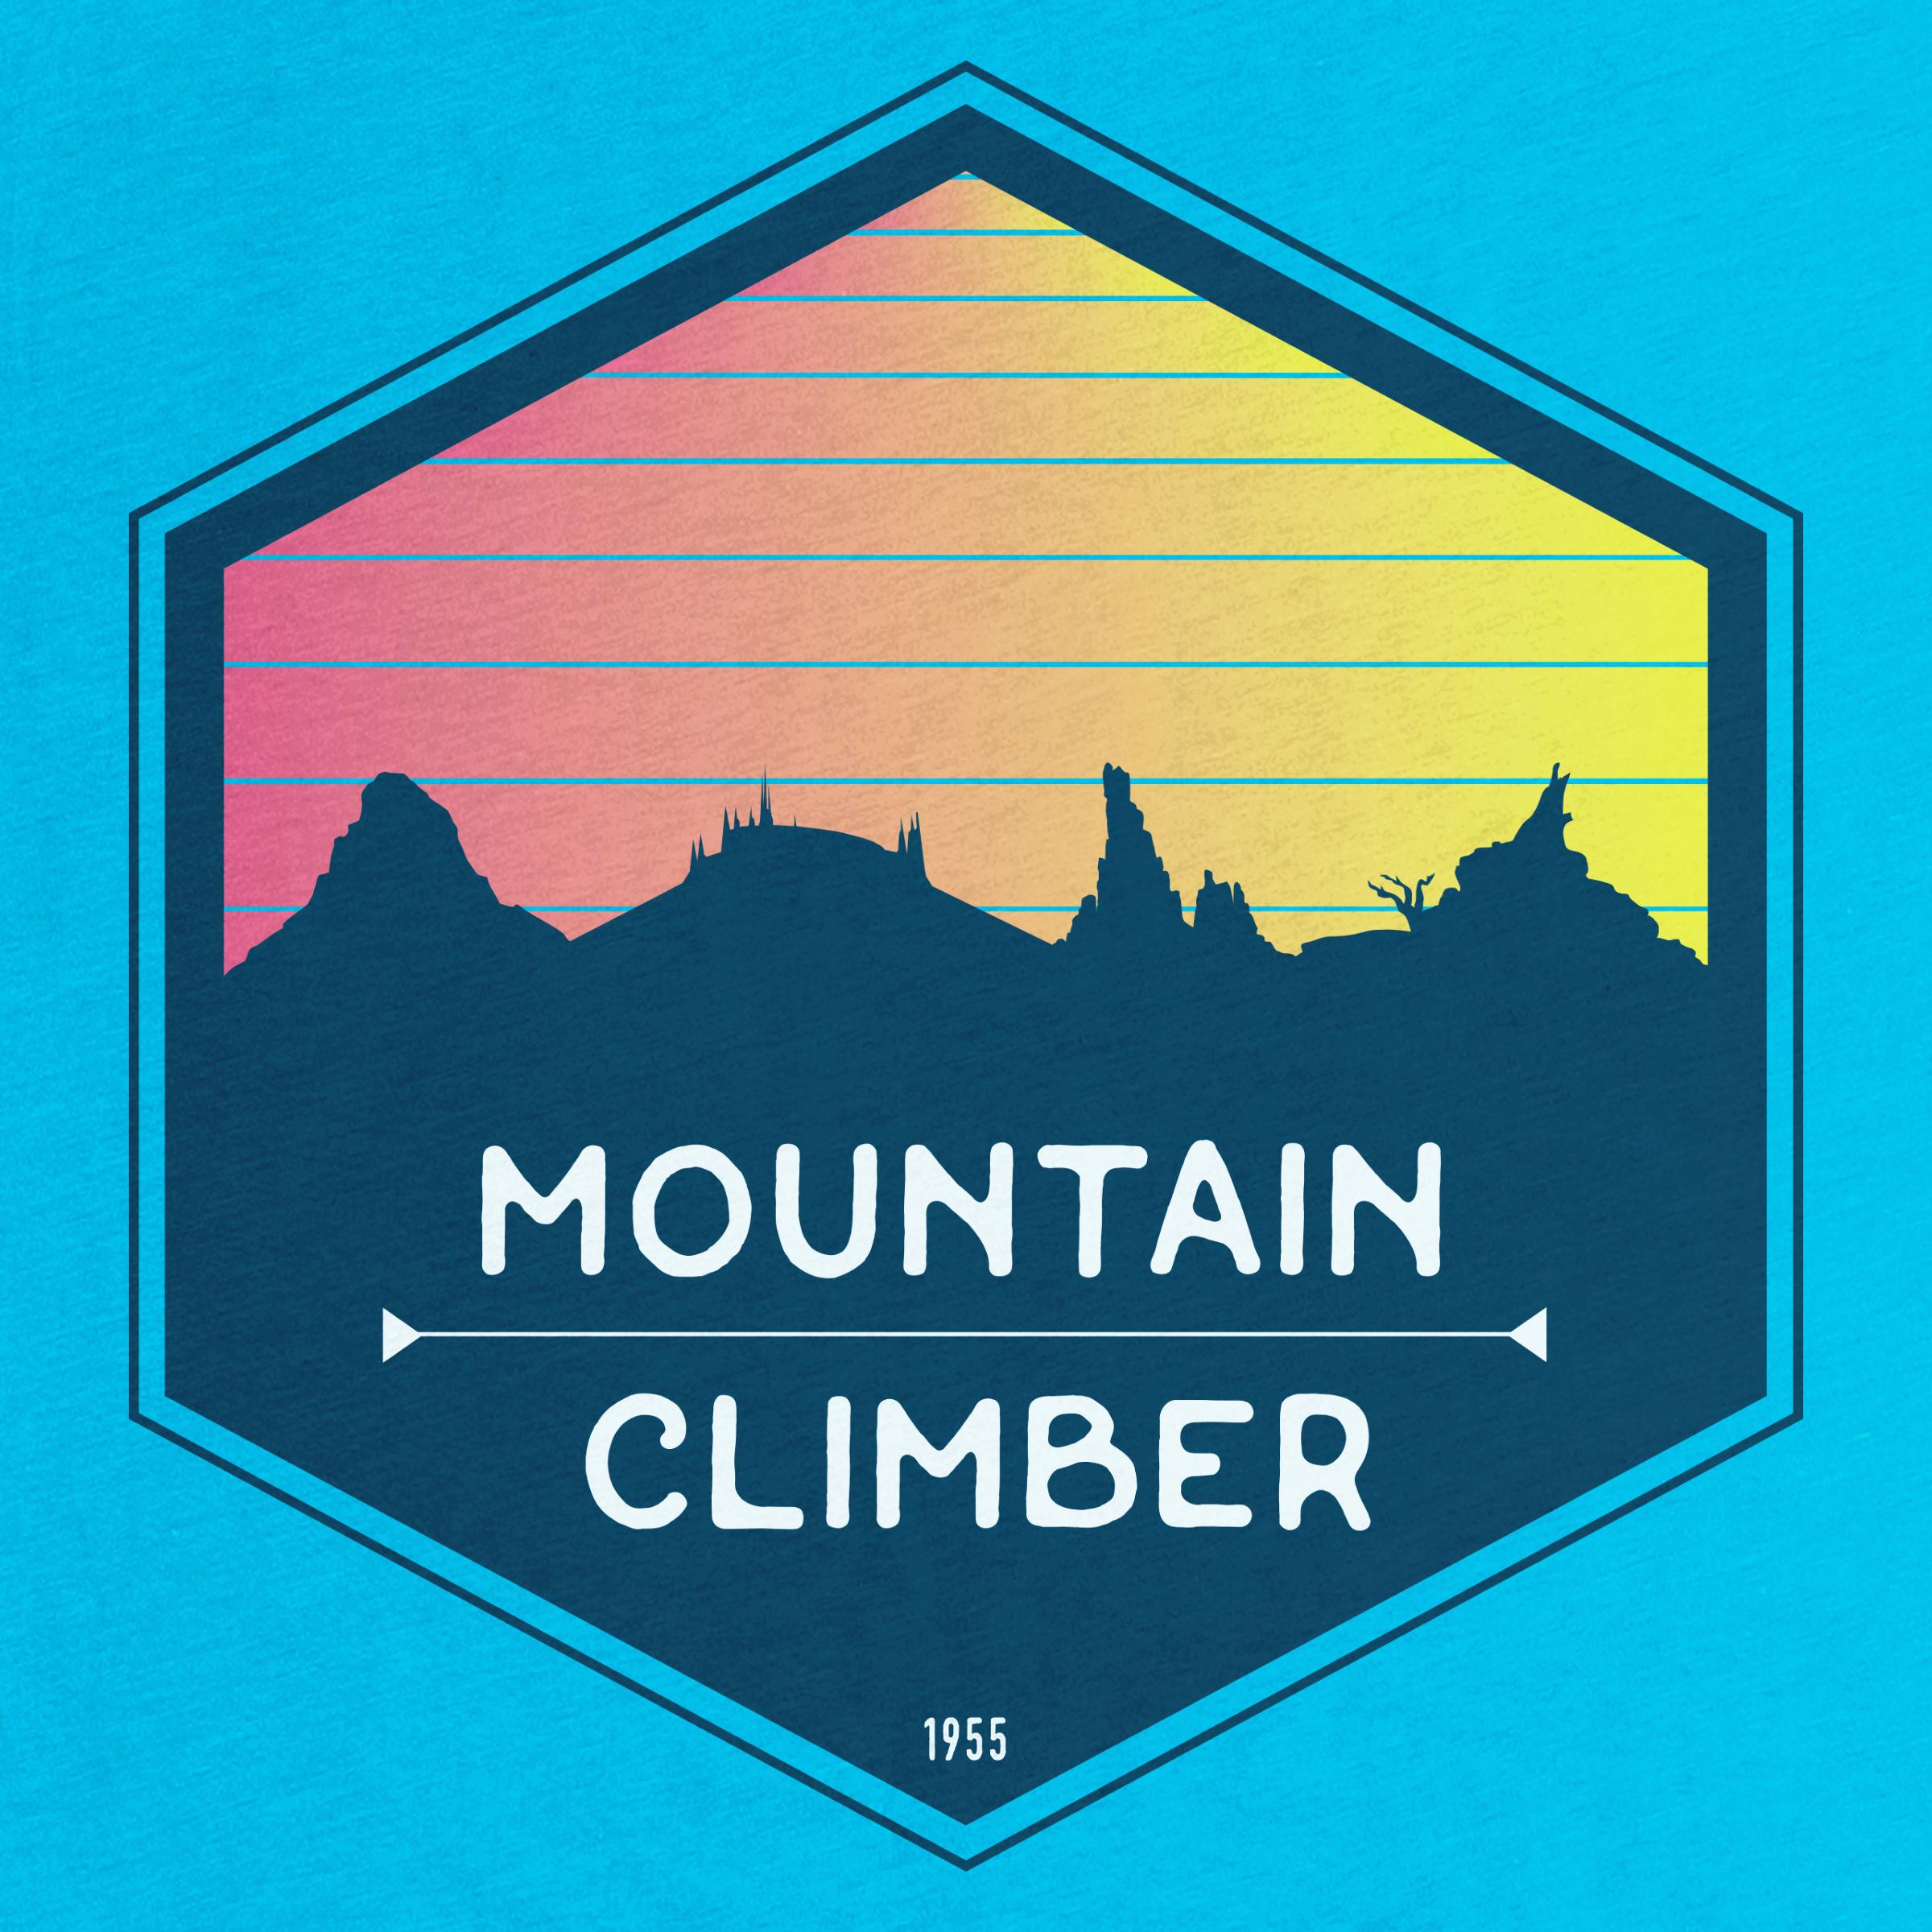 Mountain Climber Detail